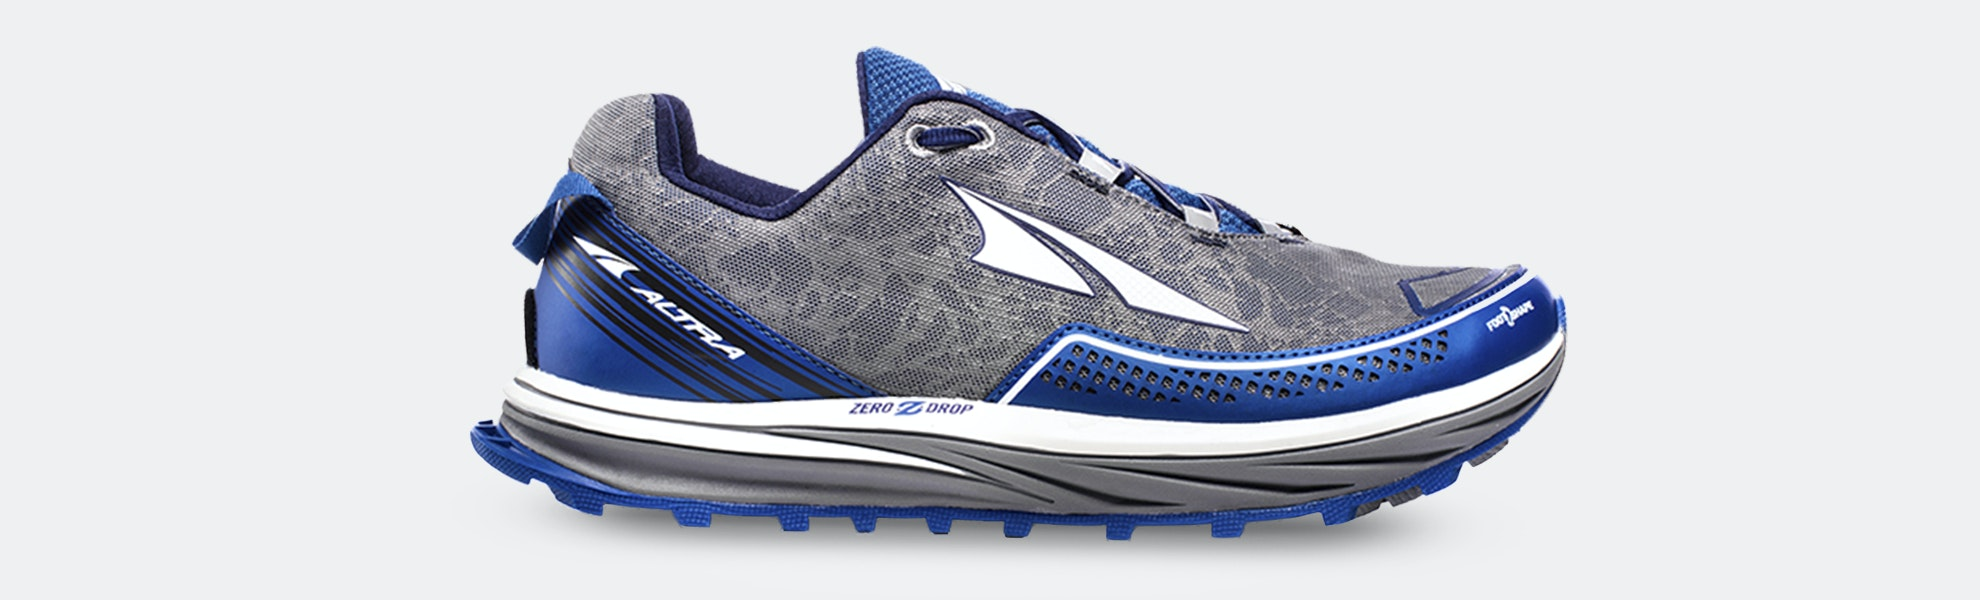 Altra Massdrop Trail Timp Running Shoes Price Reviews amp; qz1fqrZ